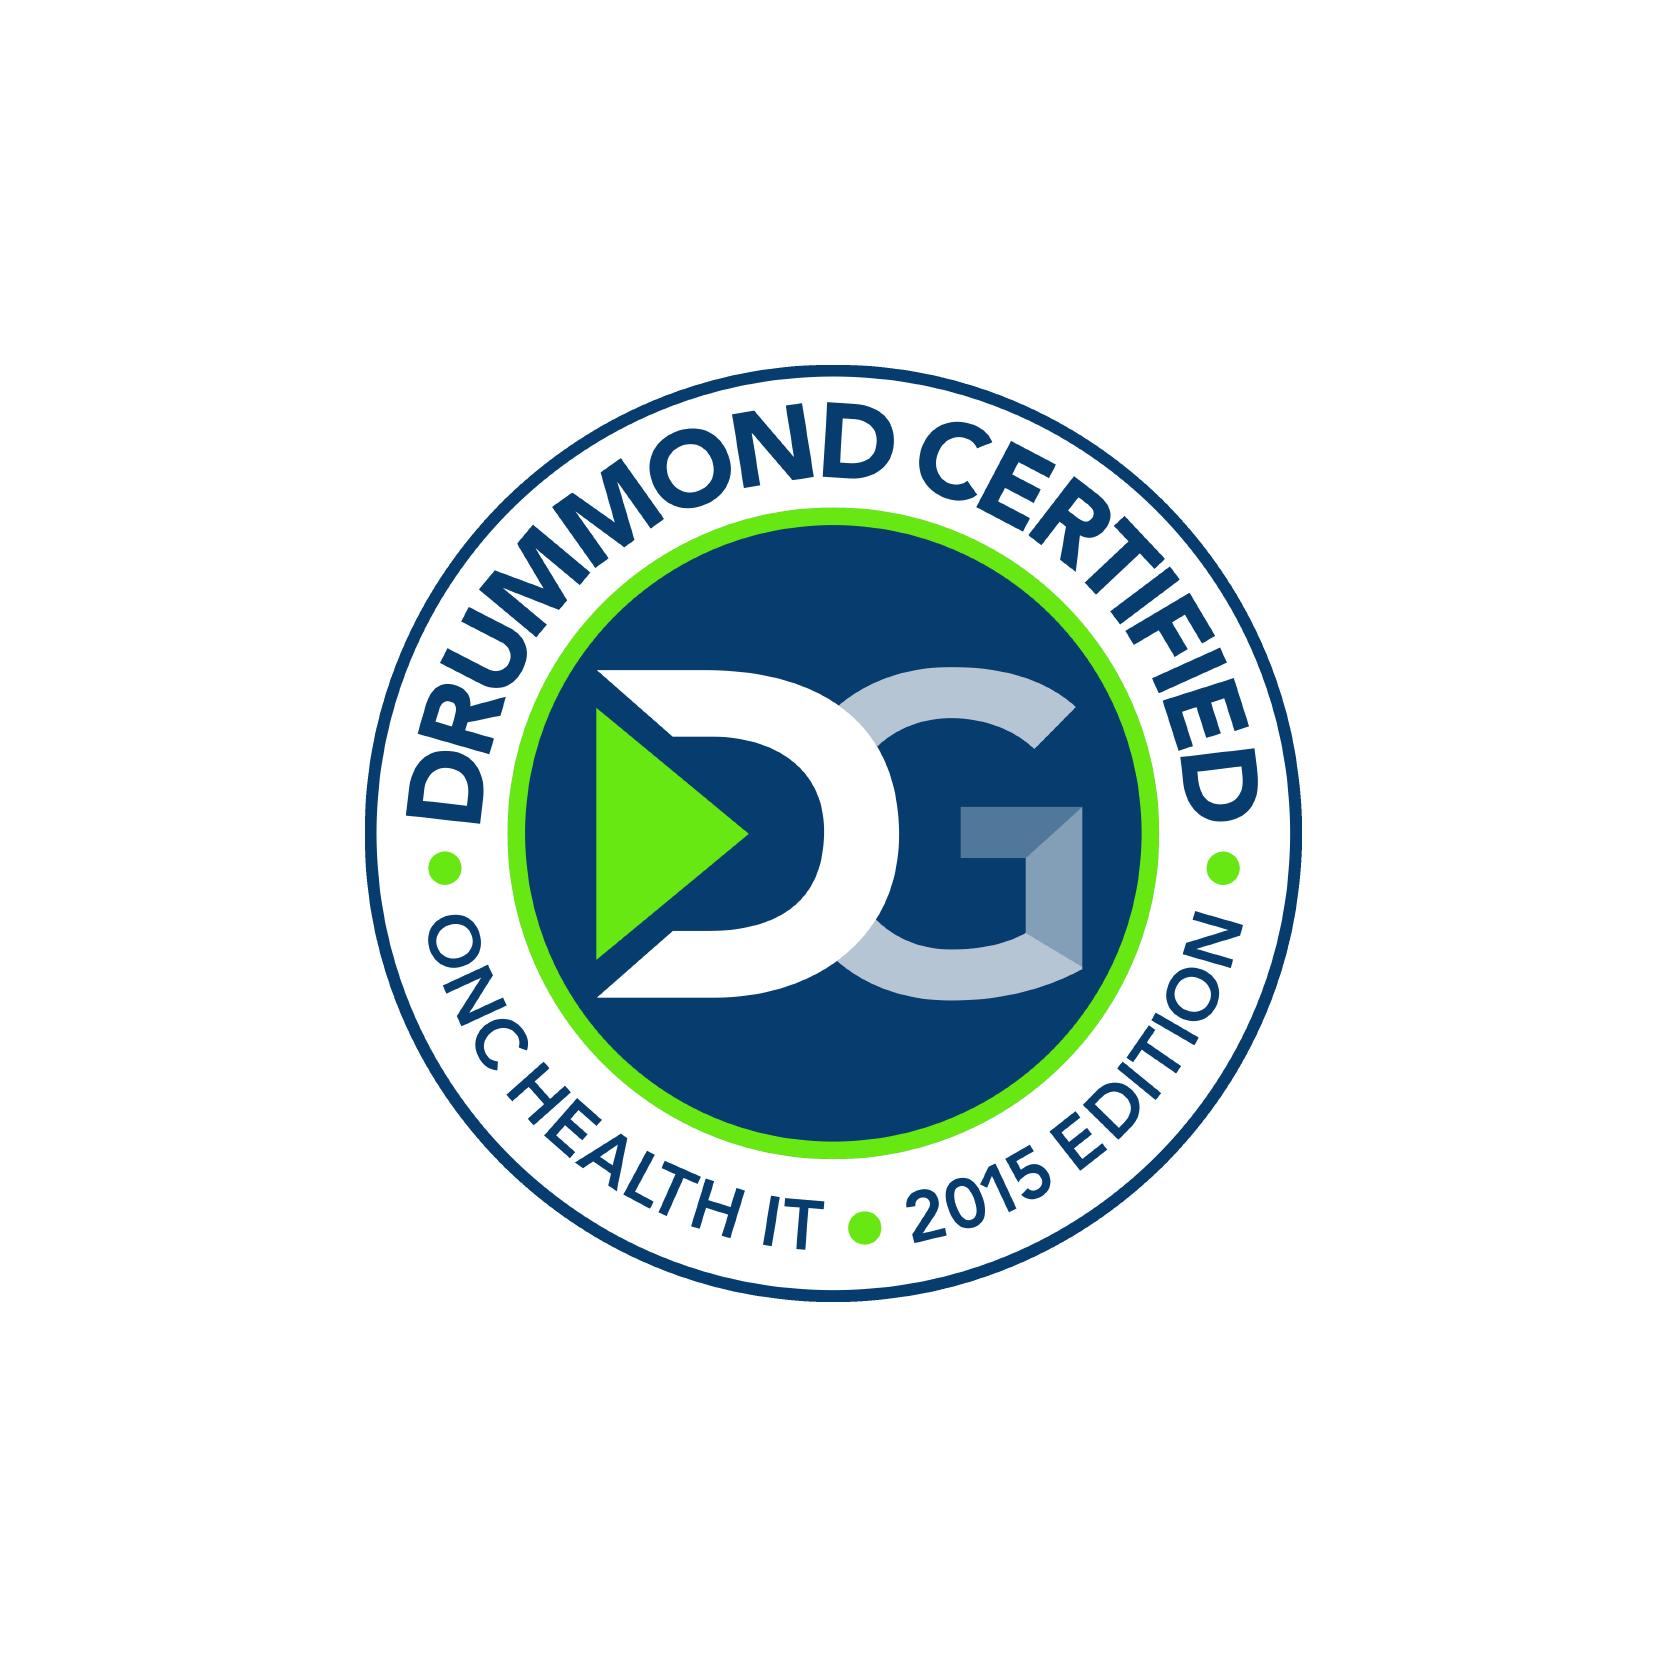 Awards_Drummond Certified 2015